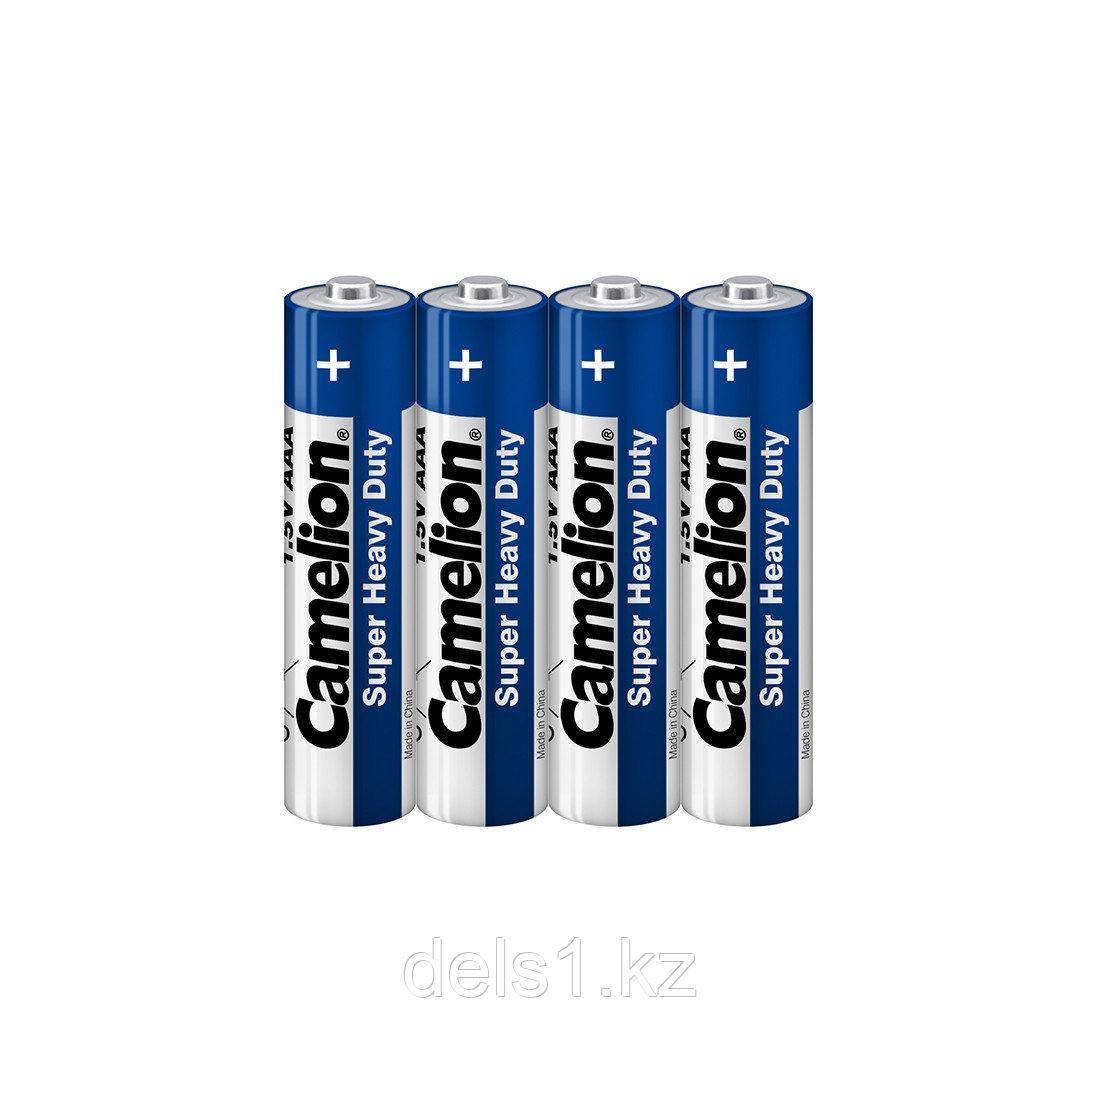 Батарейка, CAMELION, R03P-SP4B, Super Heavy Duty, AAA, 1.5V, 550 mAh, 4 шт., Плёнка